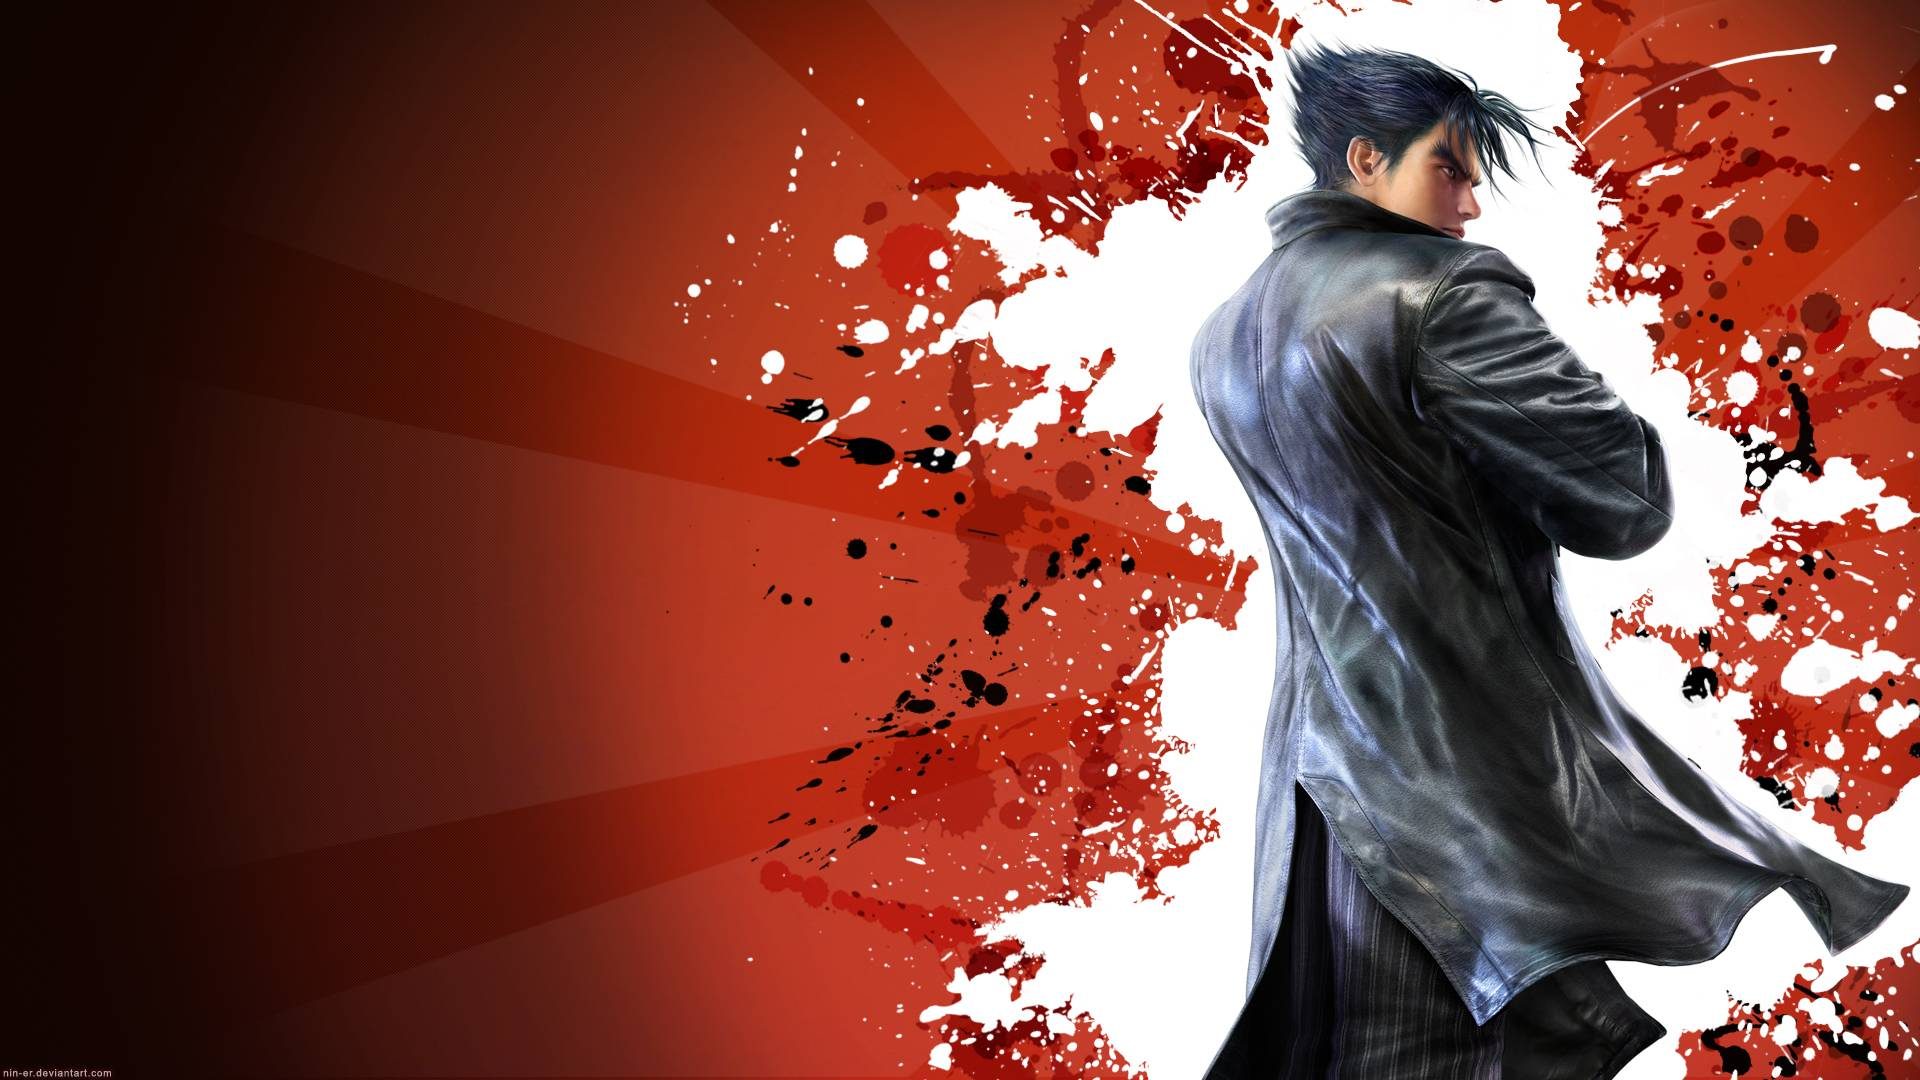 Tekken 6 Wallpapers - HD Wallpapers Inn